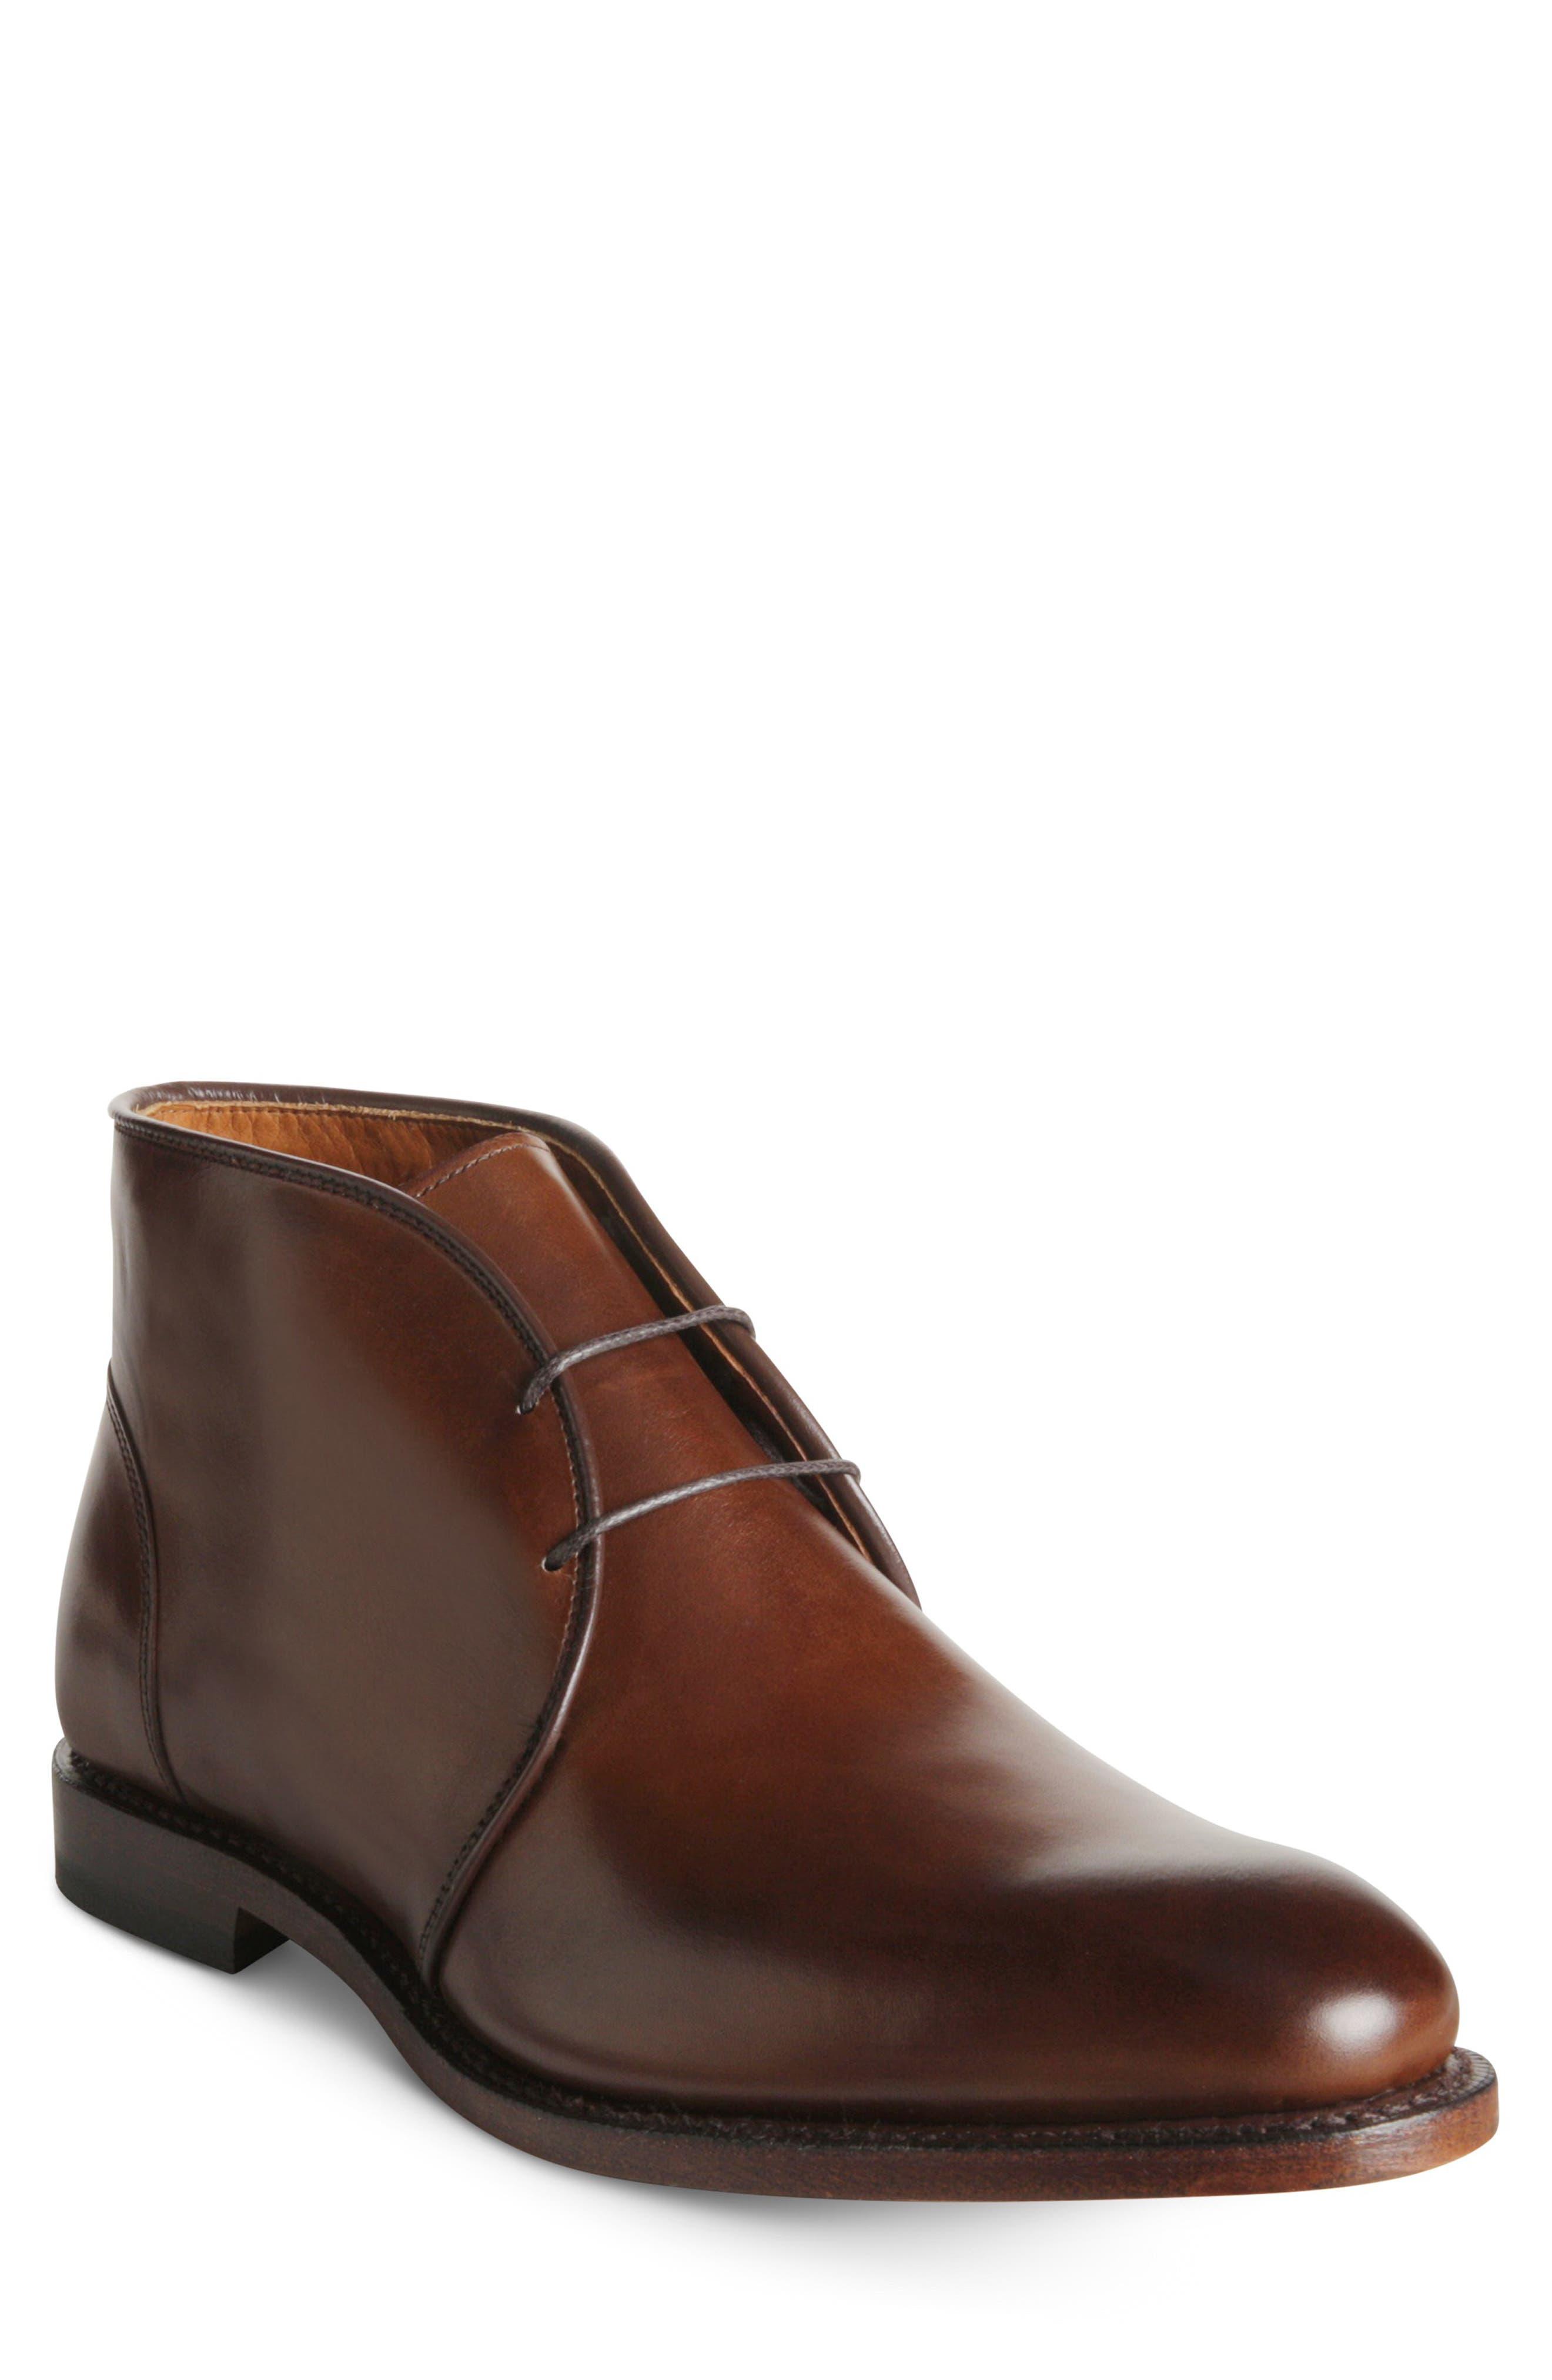 Williamsburg Chukka Boot